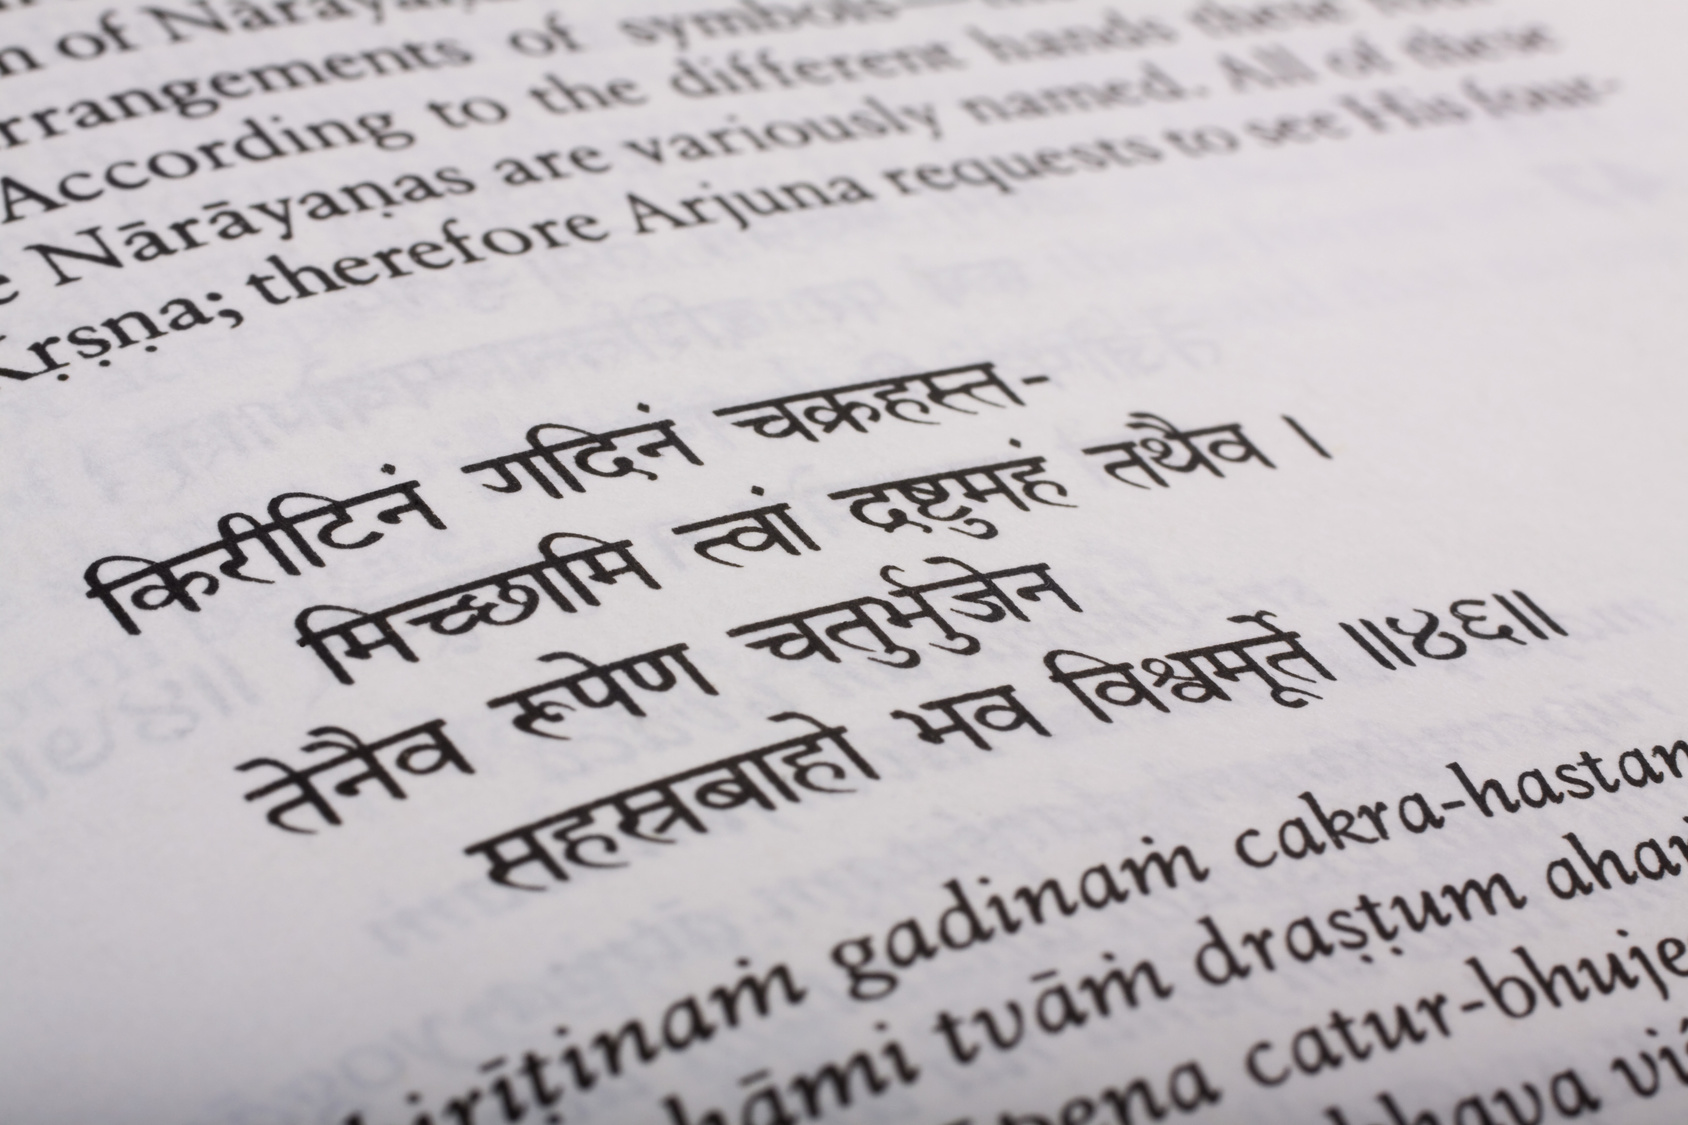 Close-up of text from the Bhagavad Gita